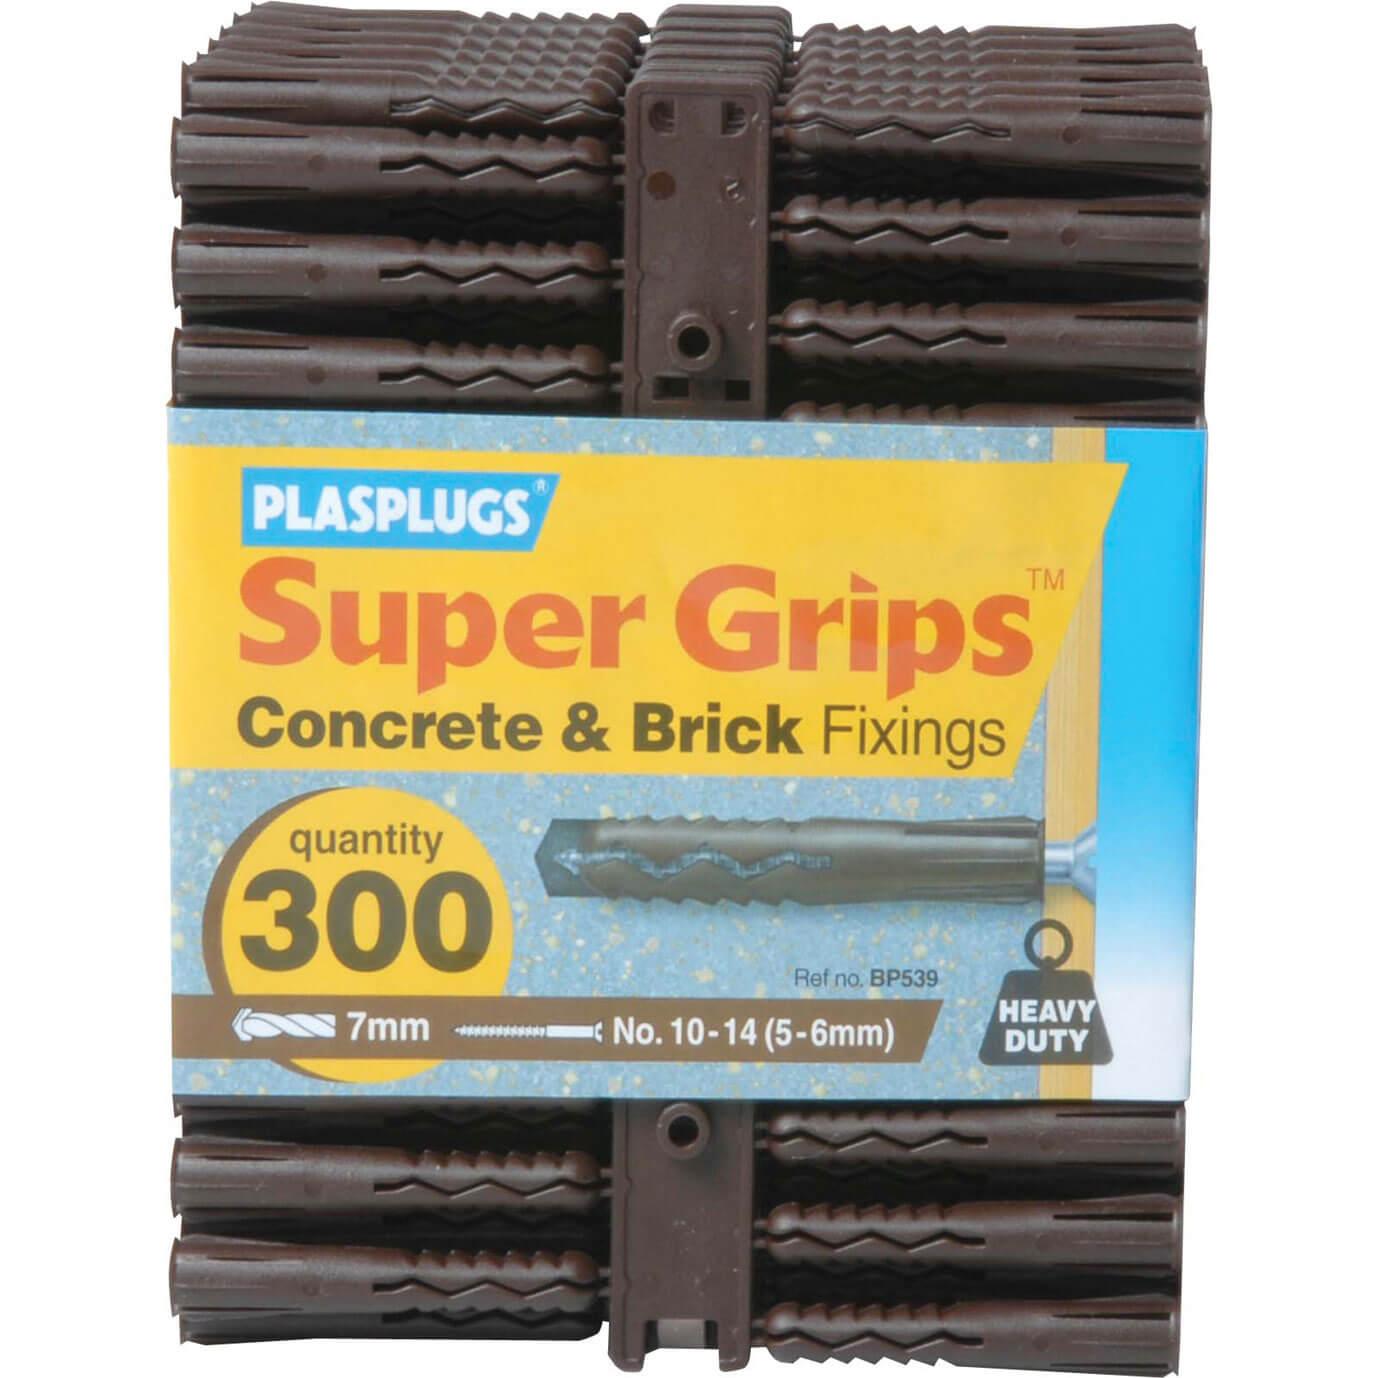 Image of Plasplugs Heavy Duty Super Grips Concrete & Brick Fixings Pack of 300